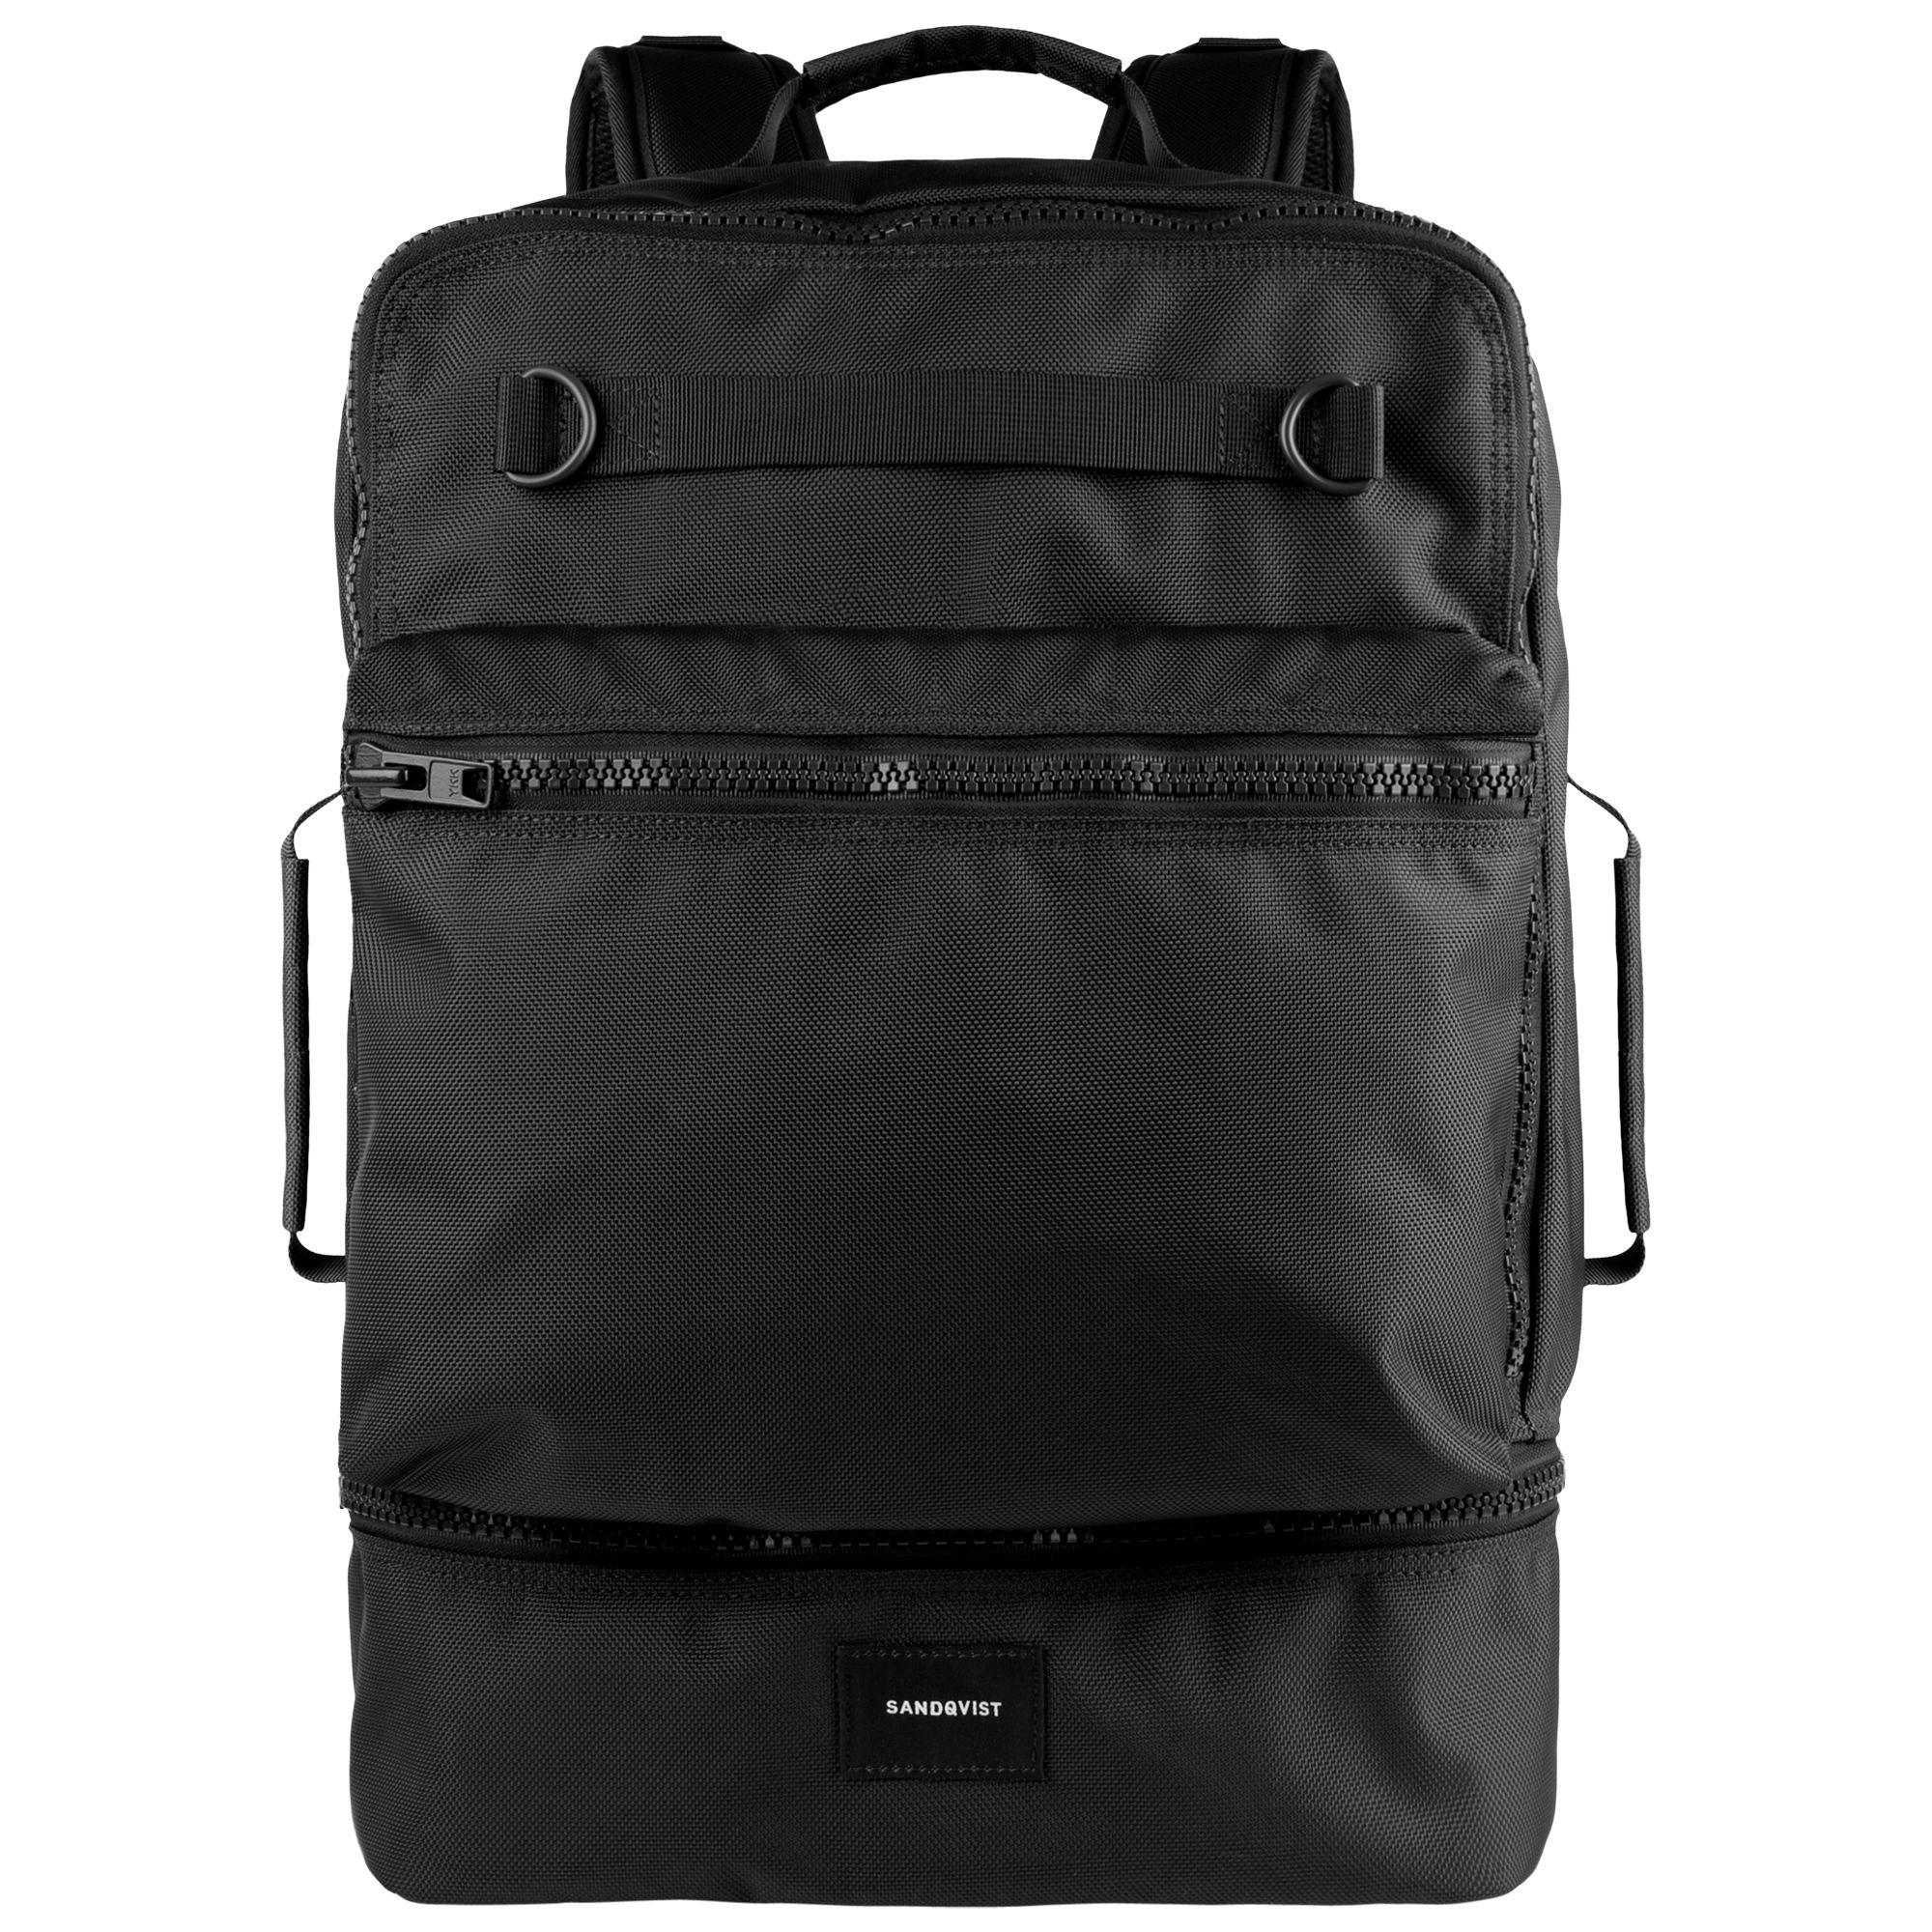 Sandqvist Sandqvist Algot Aerial Recycled Polyester Backpack